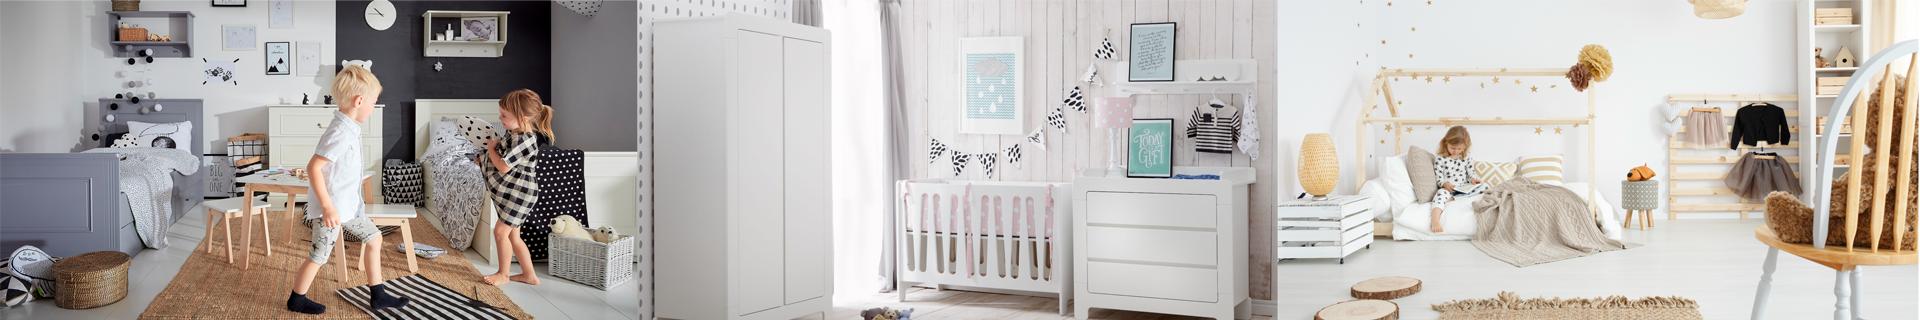 Meble Bellamy HOPPA – My Sweet Room – Meble dziecięce